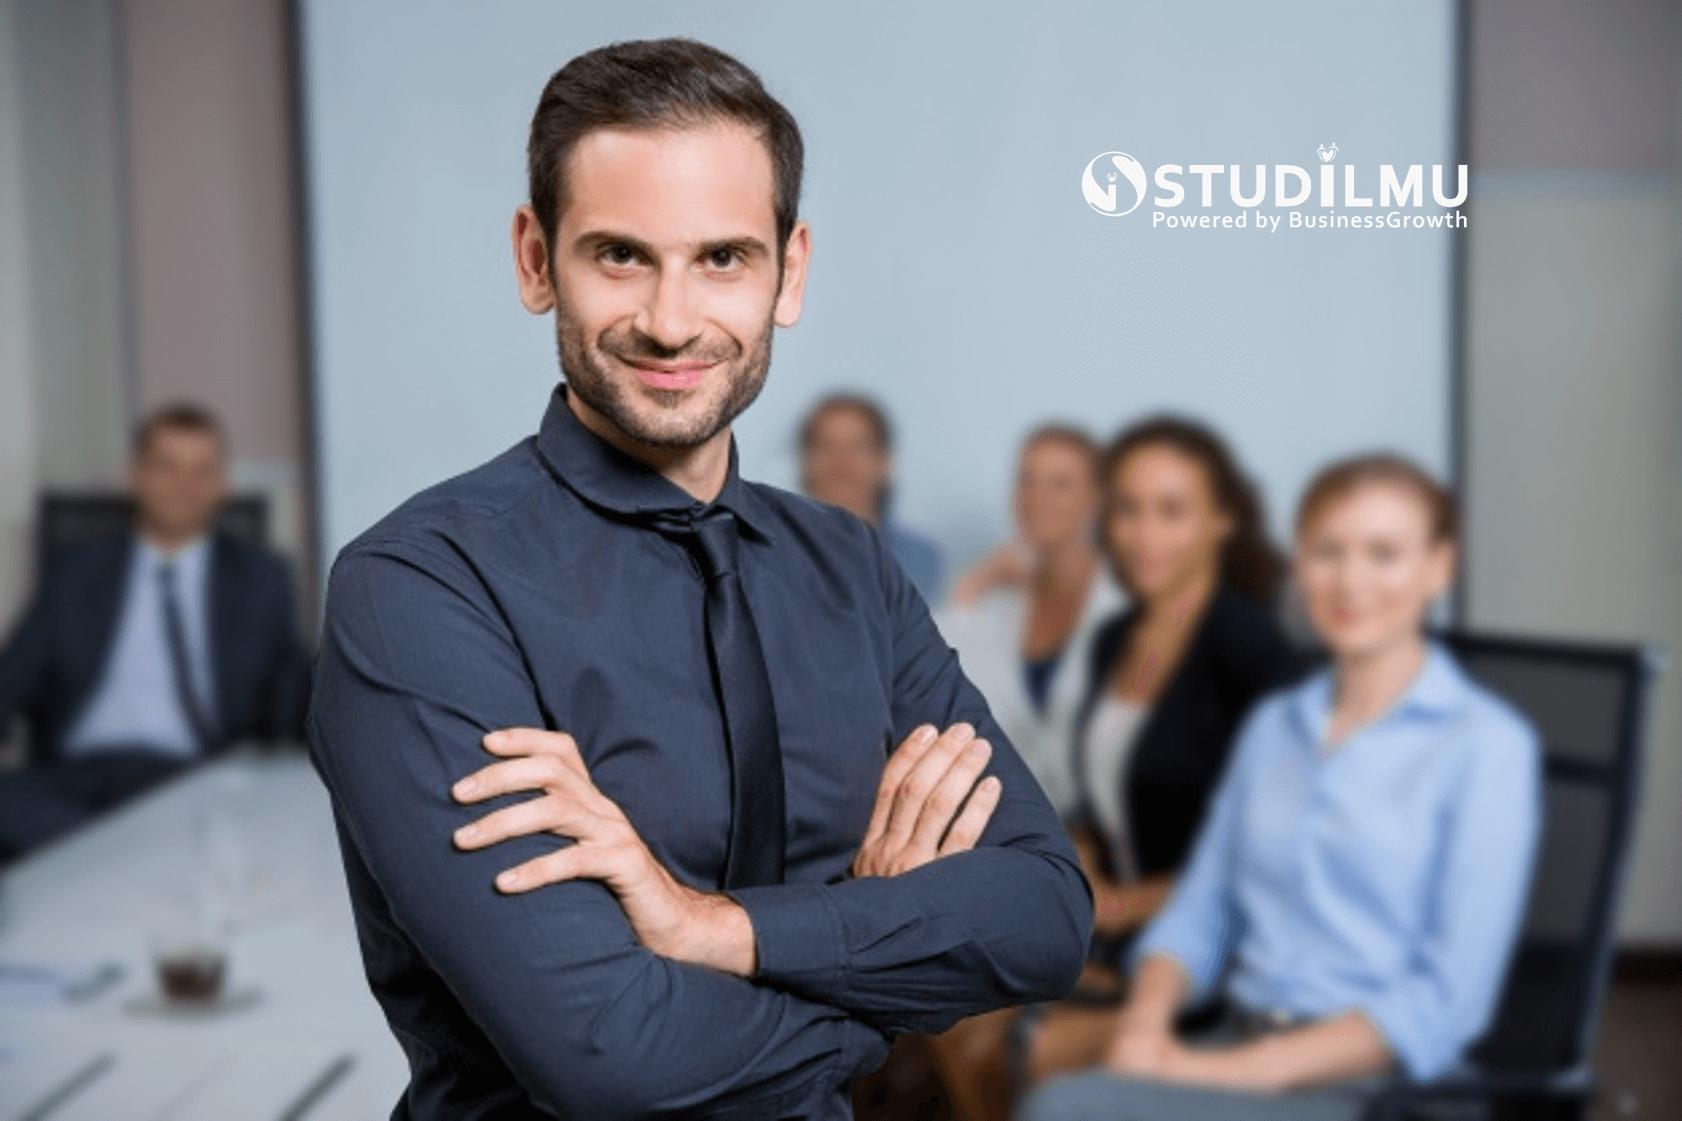 STUDILMU Career Advice - 6 Gaya Kepemimpinan dalam Menjadi Manajer yang Efektif